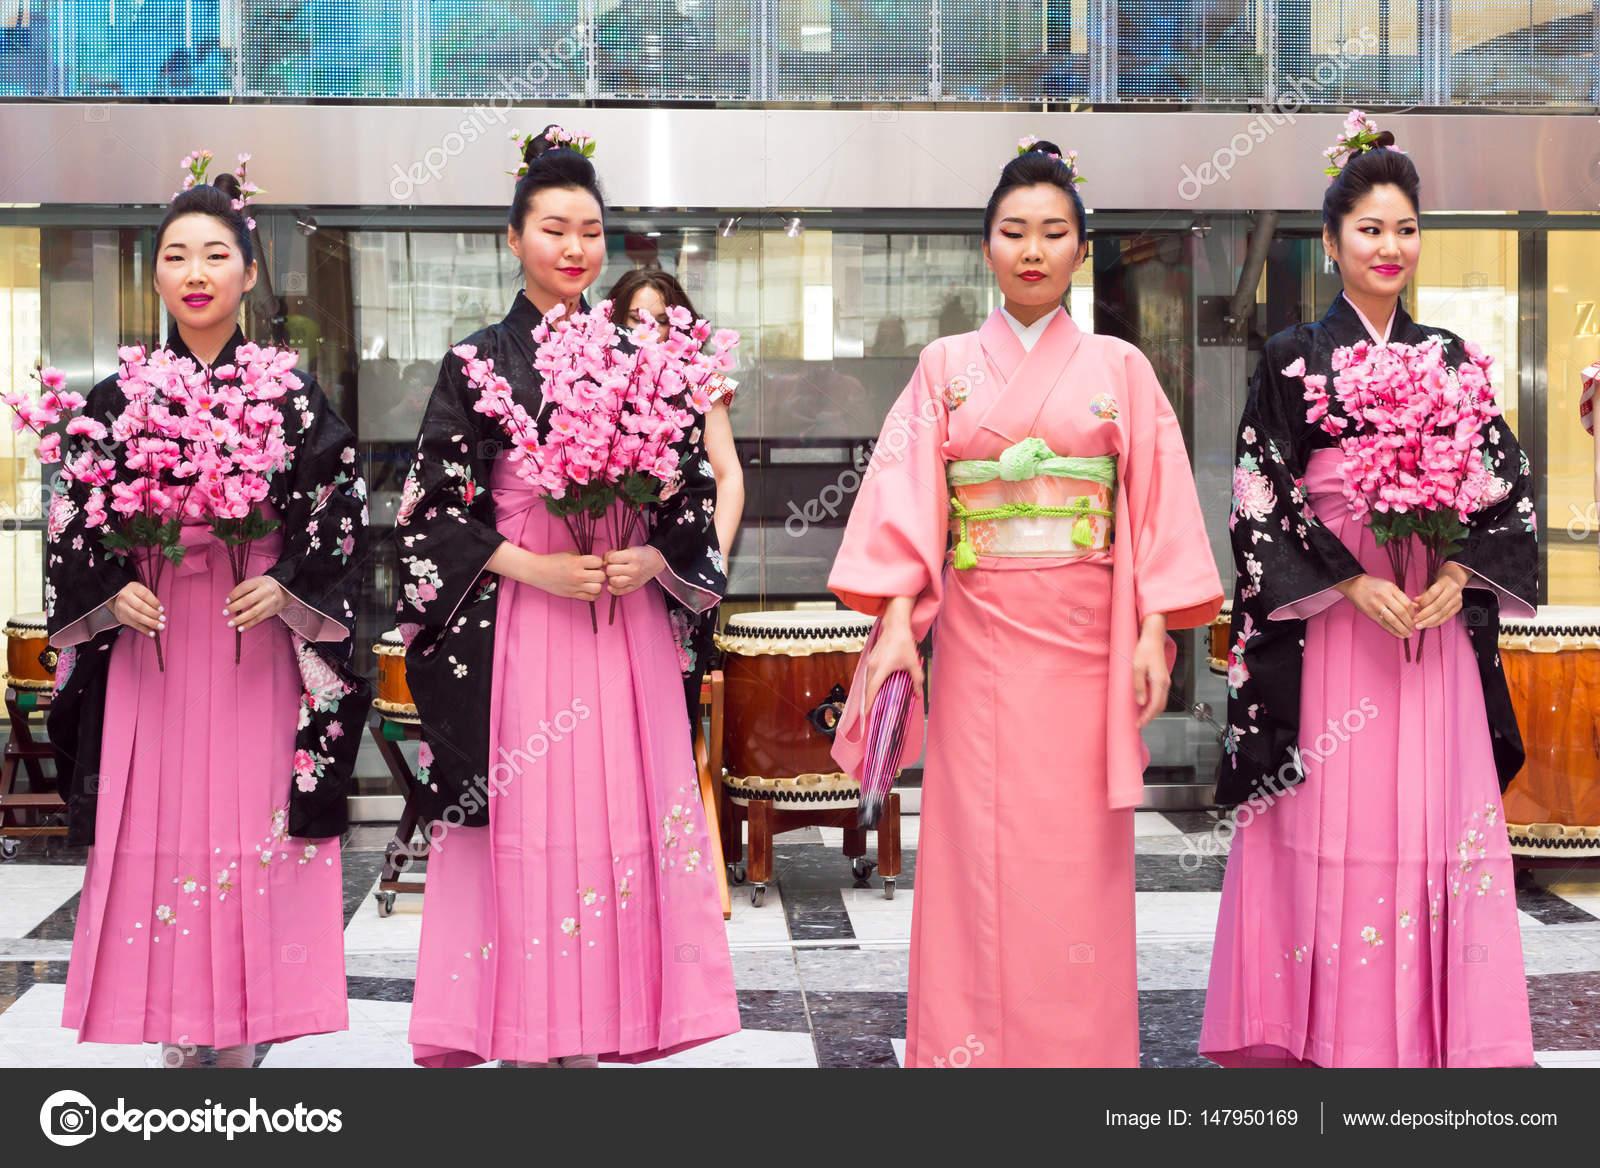 Moscú, Rusia - 24 de marzo de 2017: Grupo de chicas japonés geisha ...